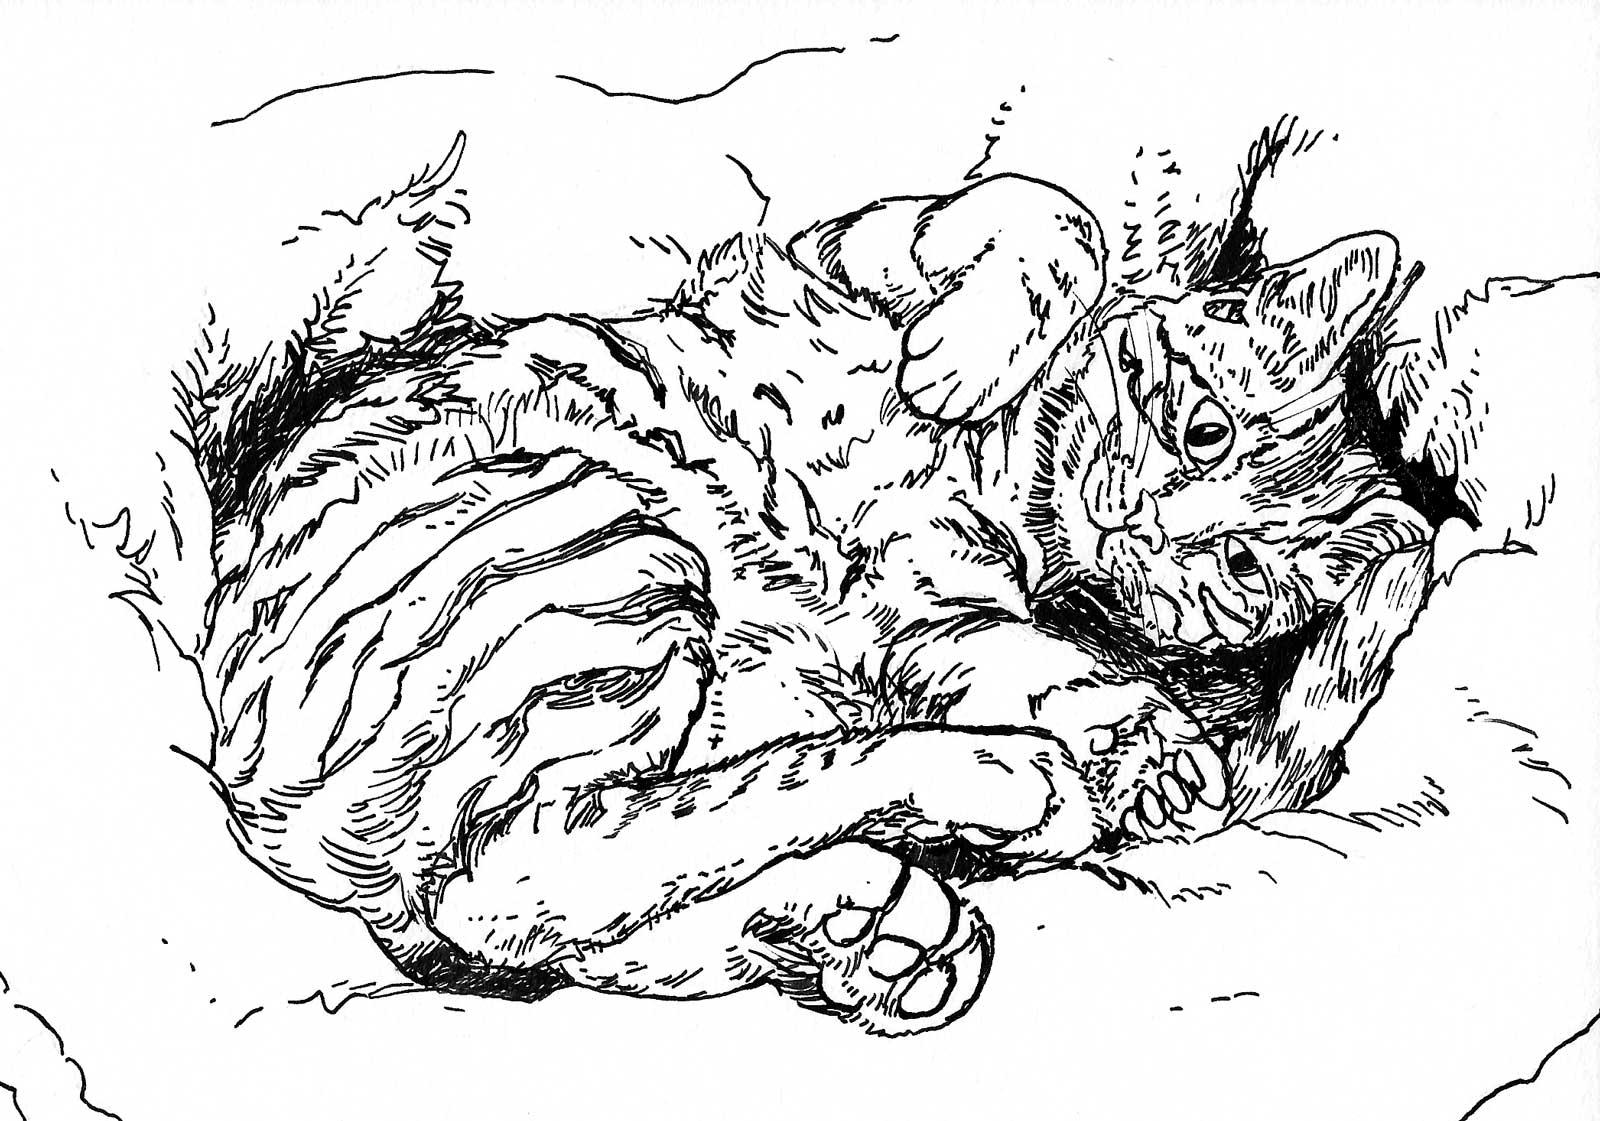 1_CW-Cat-Art